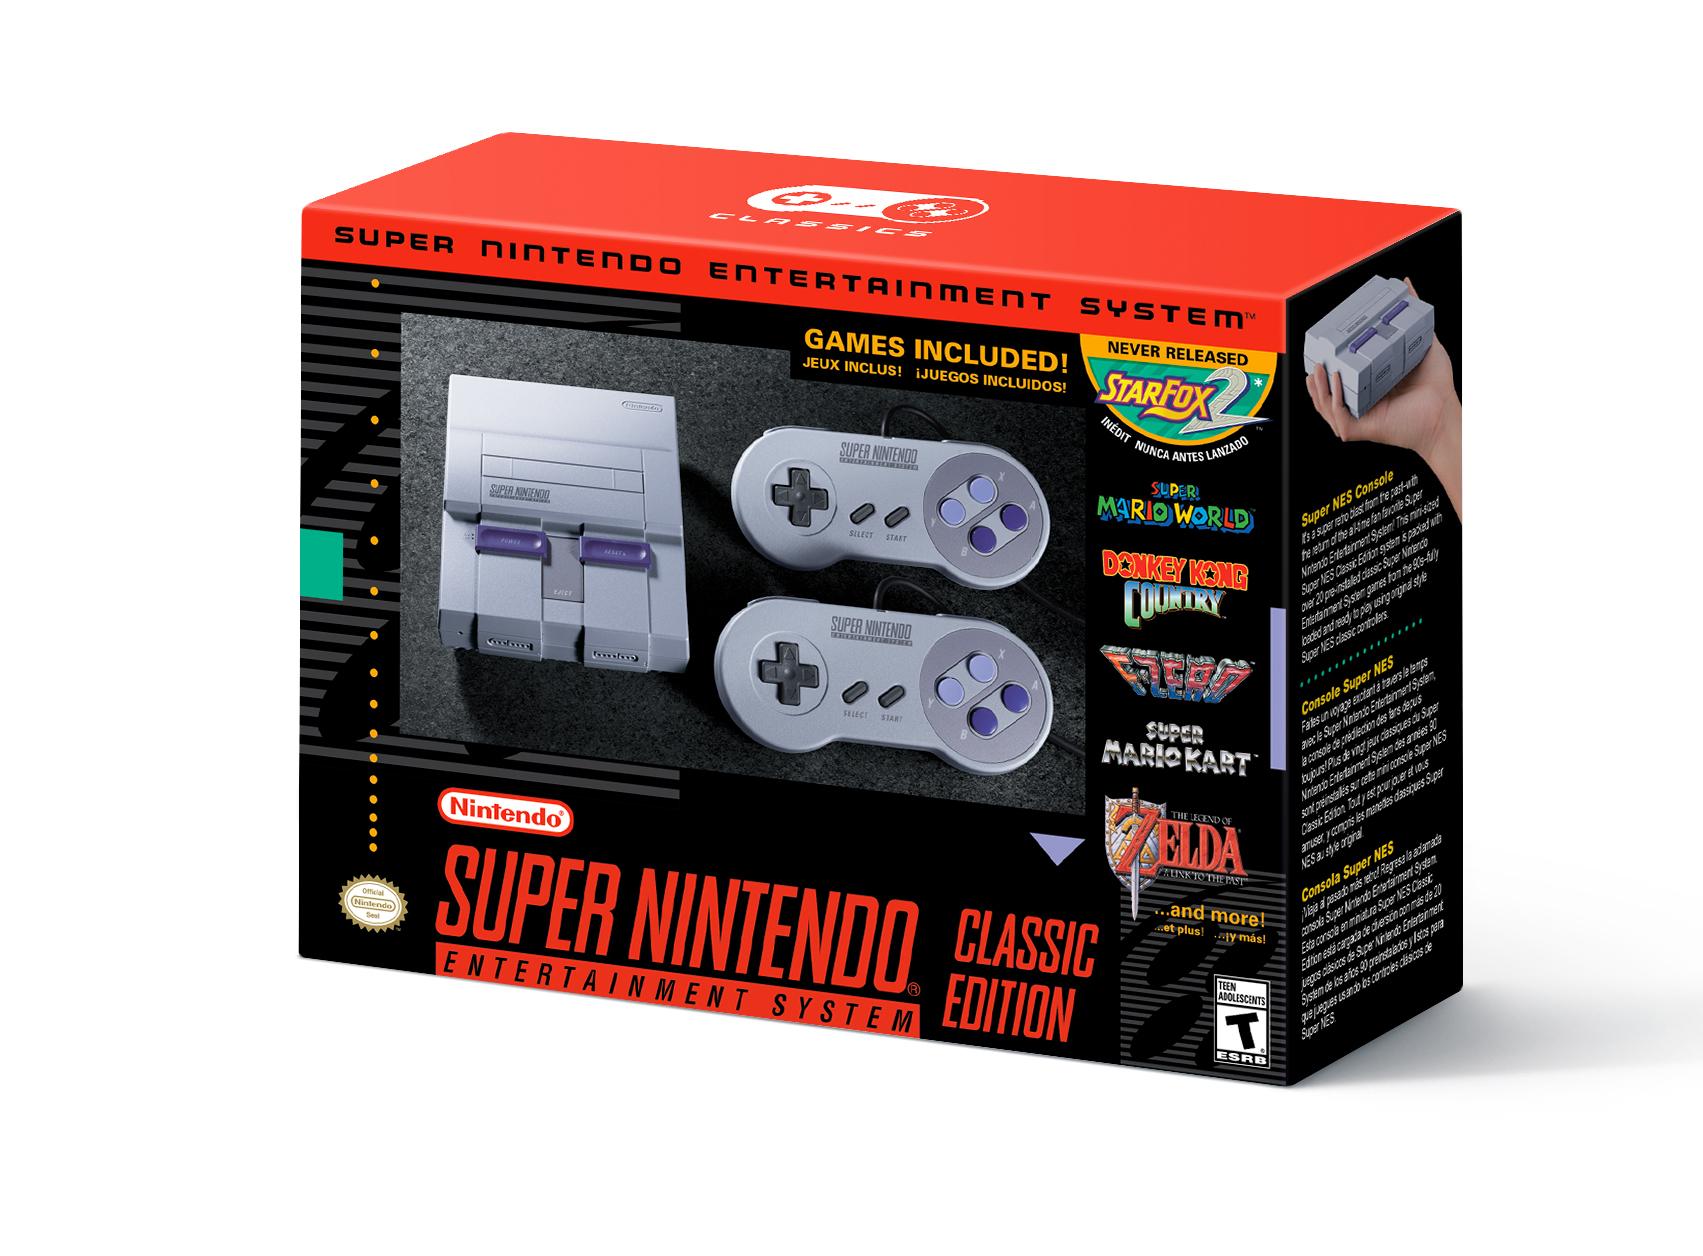 Nintendo Officially Announces Super NES Classic Edition!